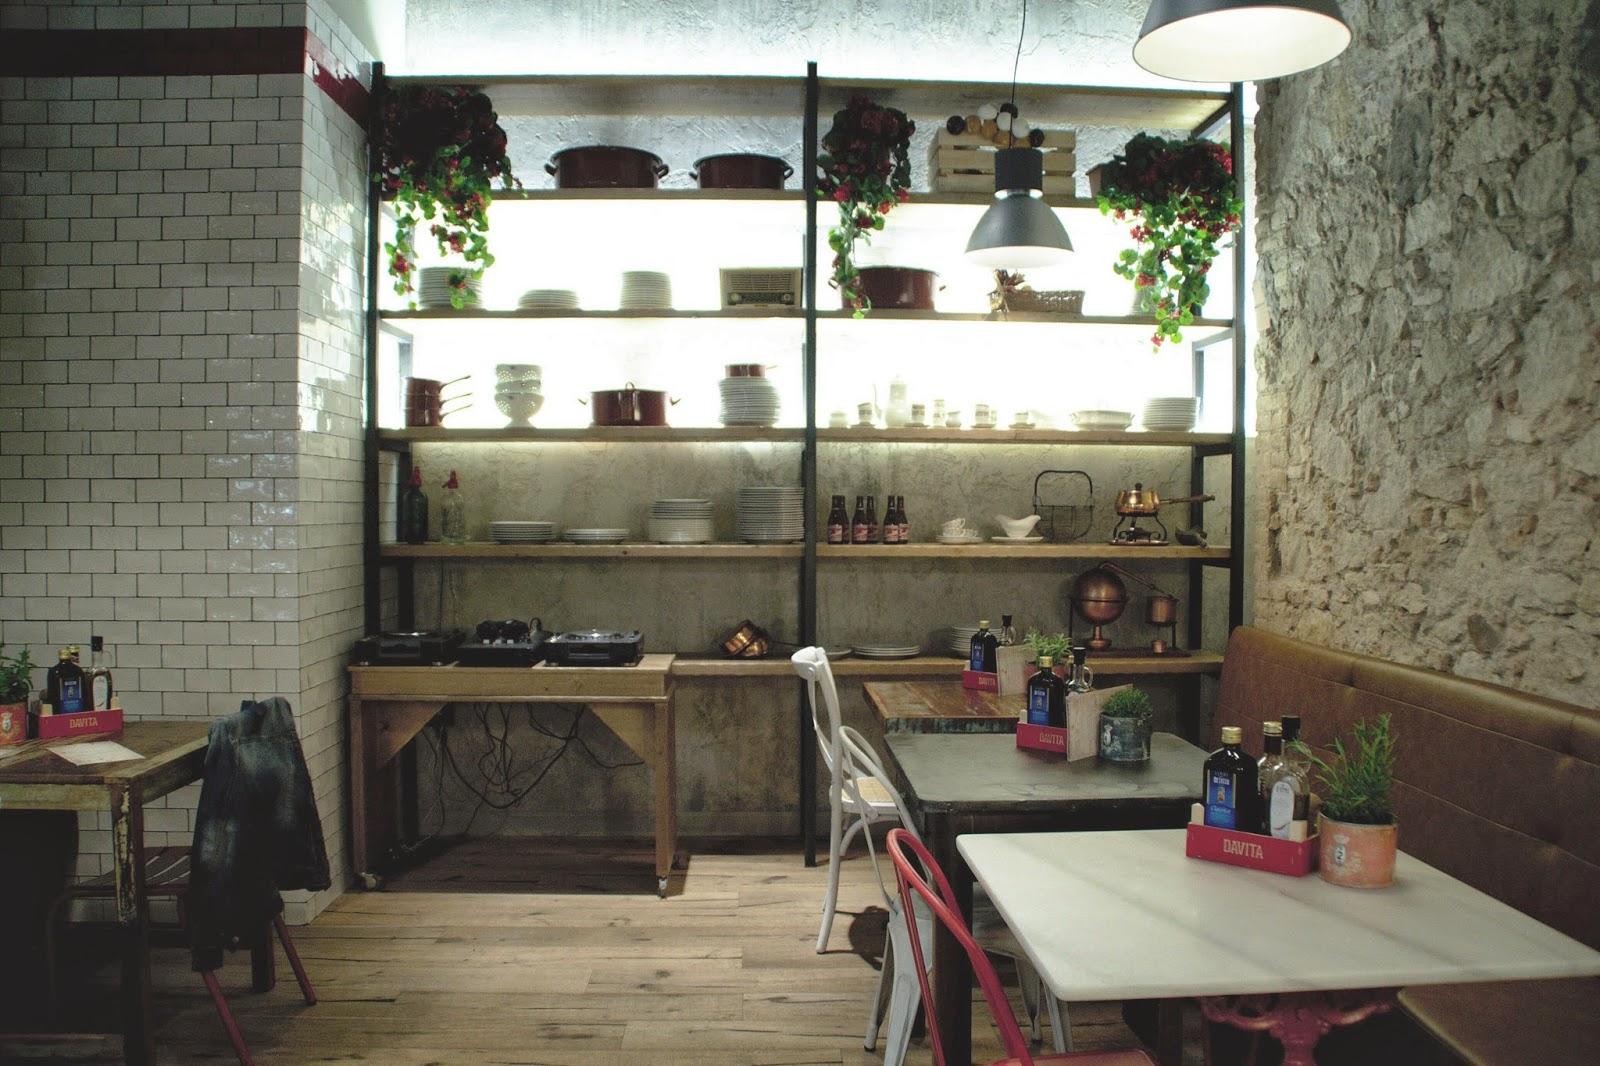 Davita Market restaurante Barcelona